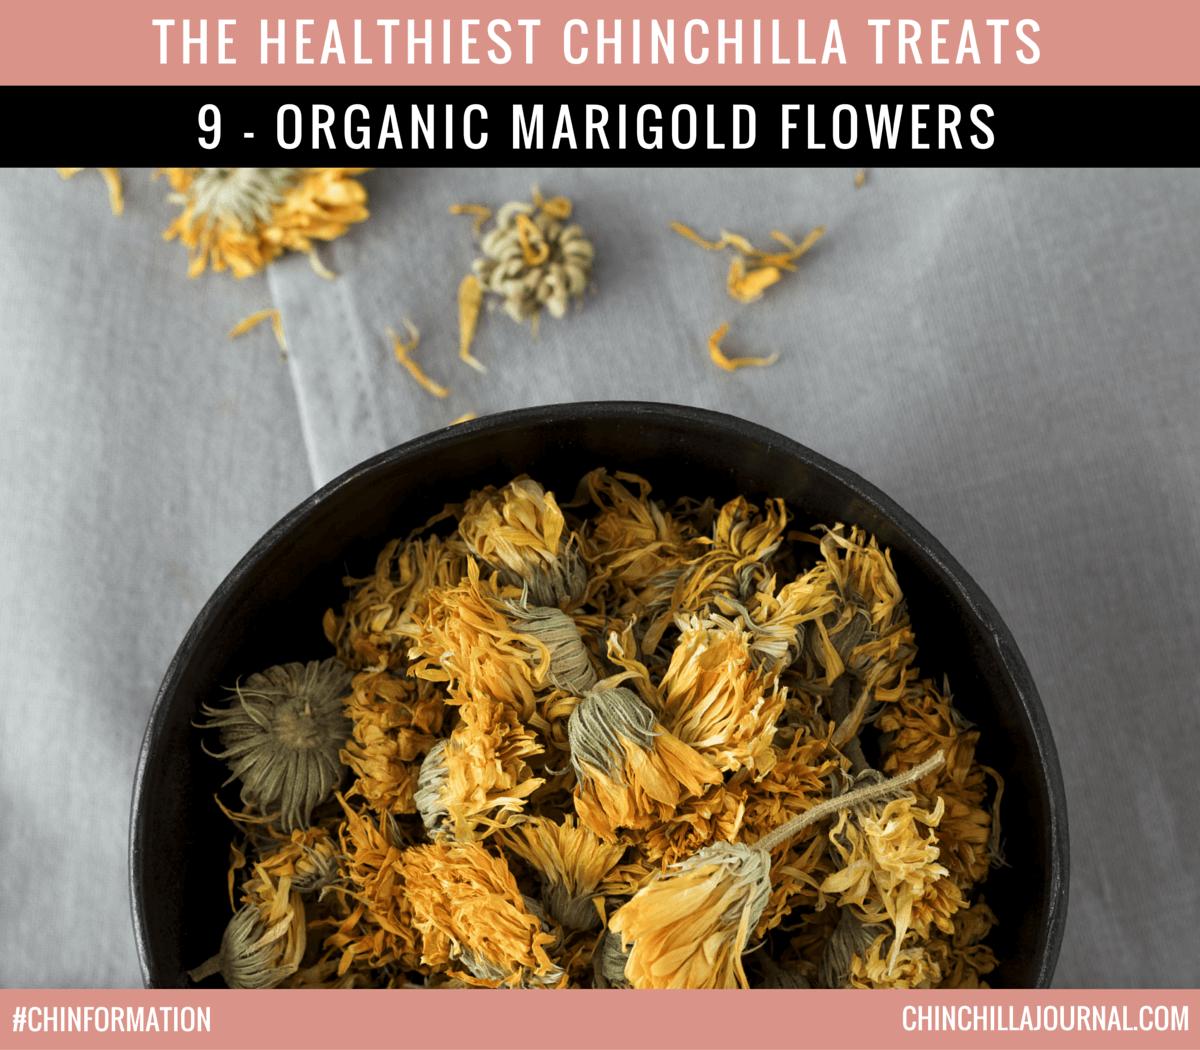 The Healthiest Chinchilla Treats - 9 - Organic Marigold Flowers